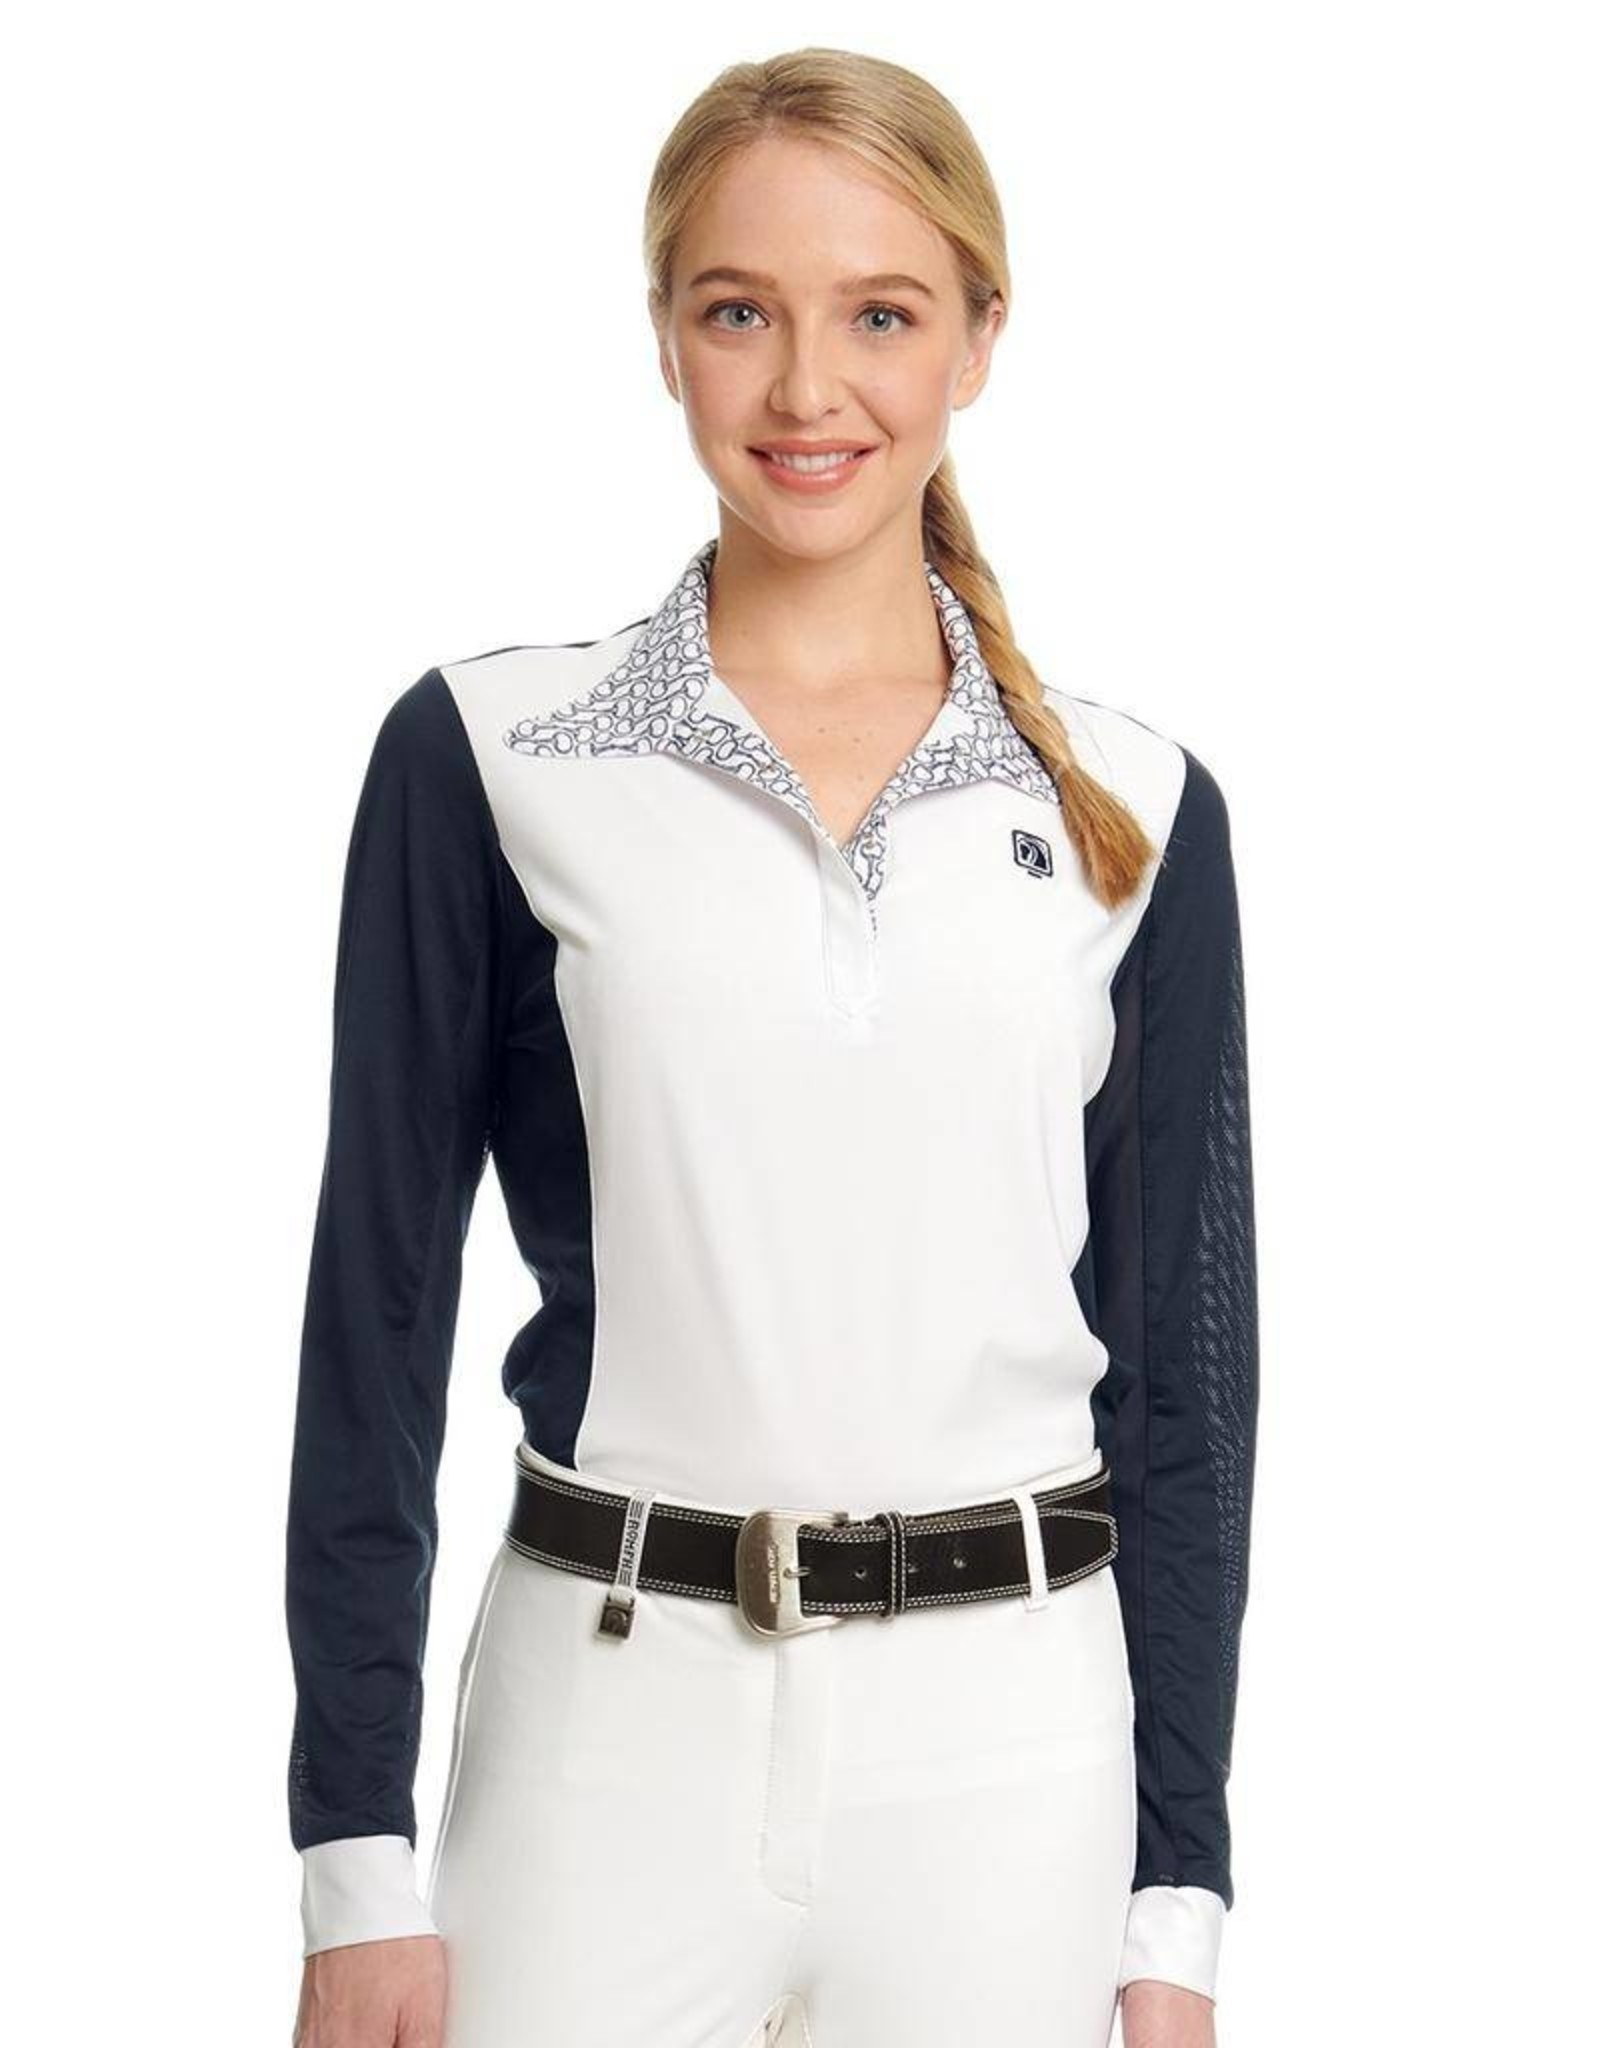 Romfh Signature Long Sleeve Show Shirt